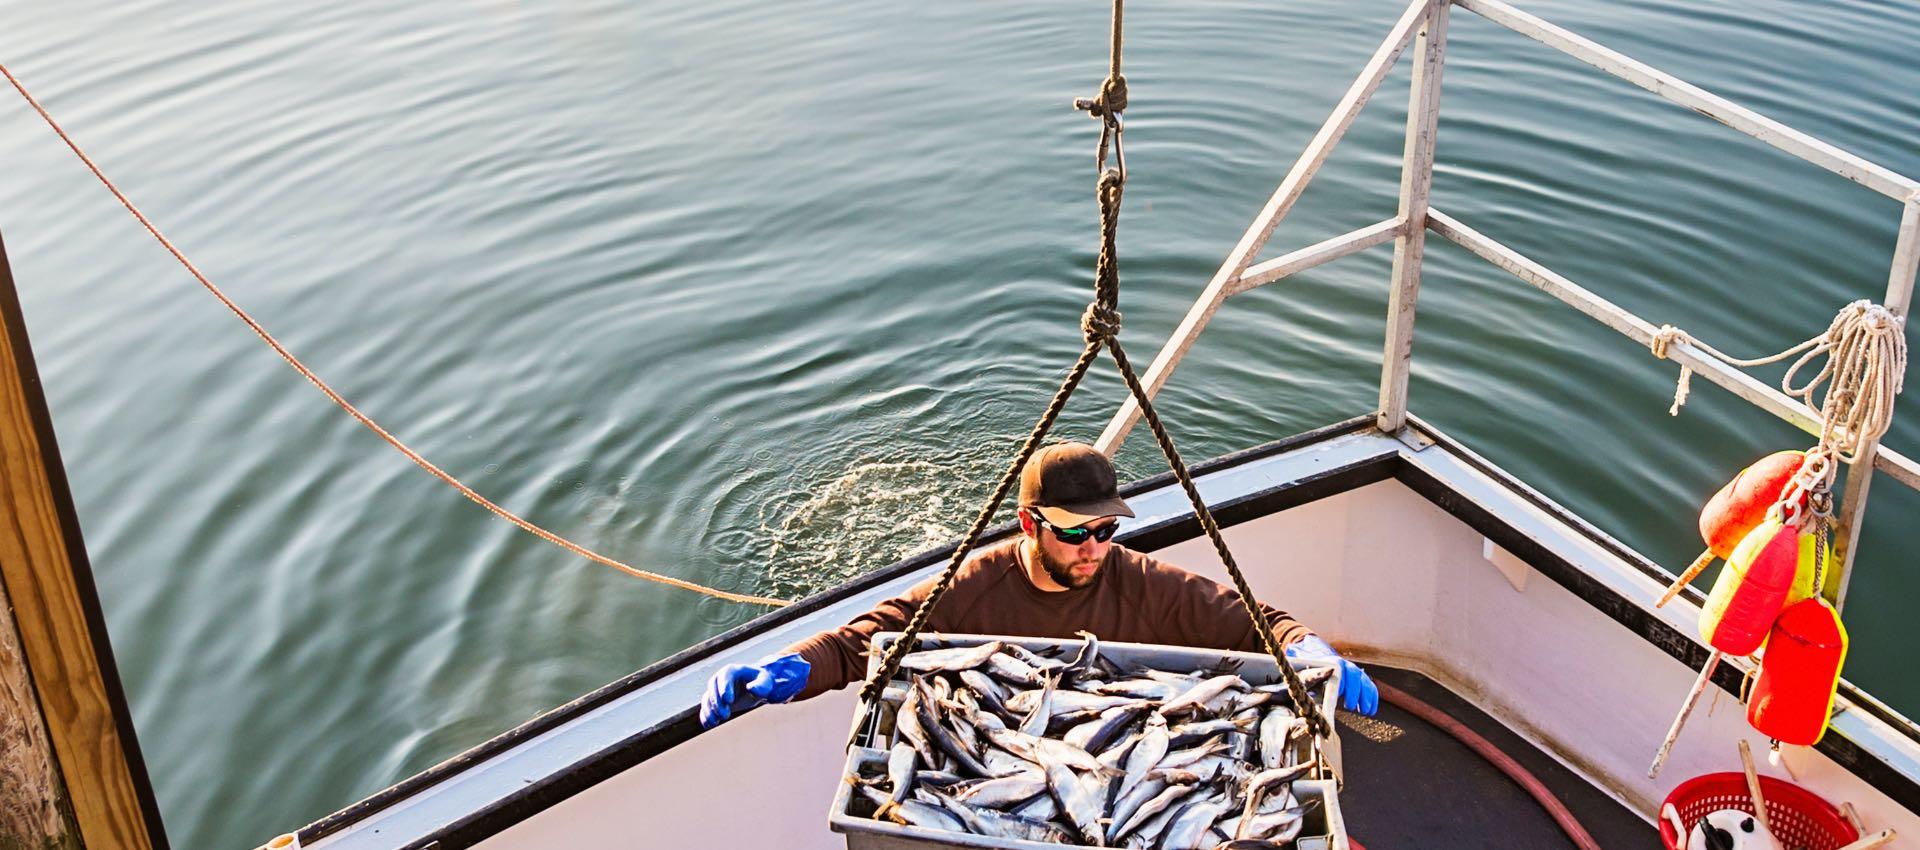 New England wholesale seafood sales